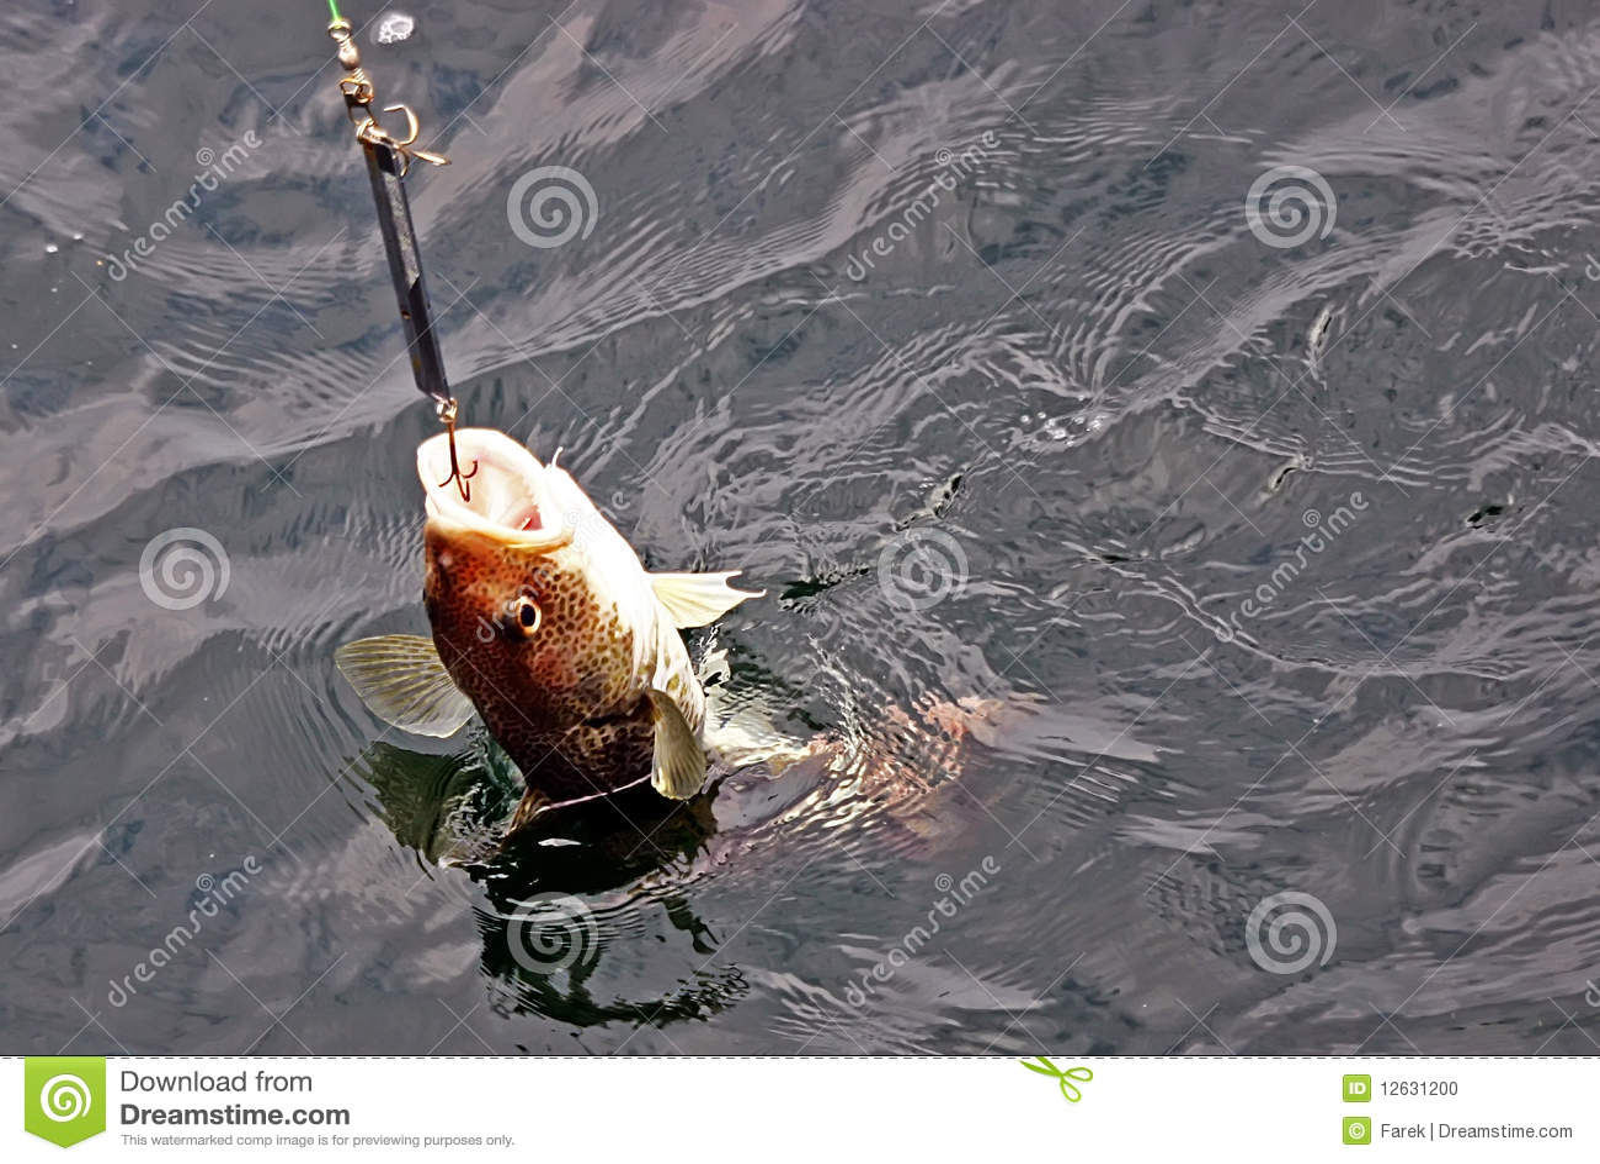 Cod hooked stock photo image 12631200 for Cod fish mercury